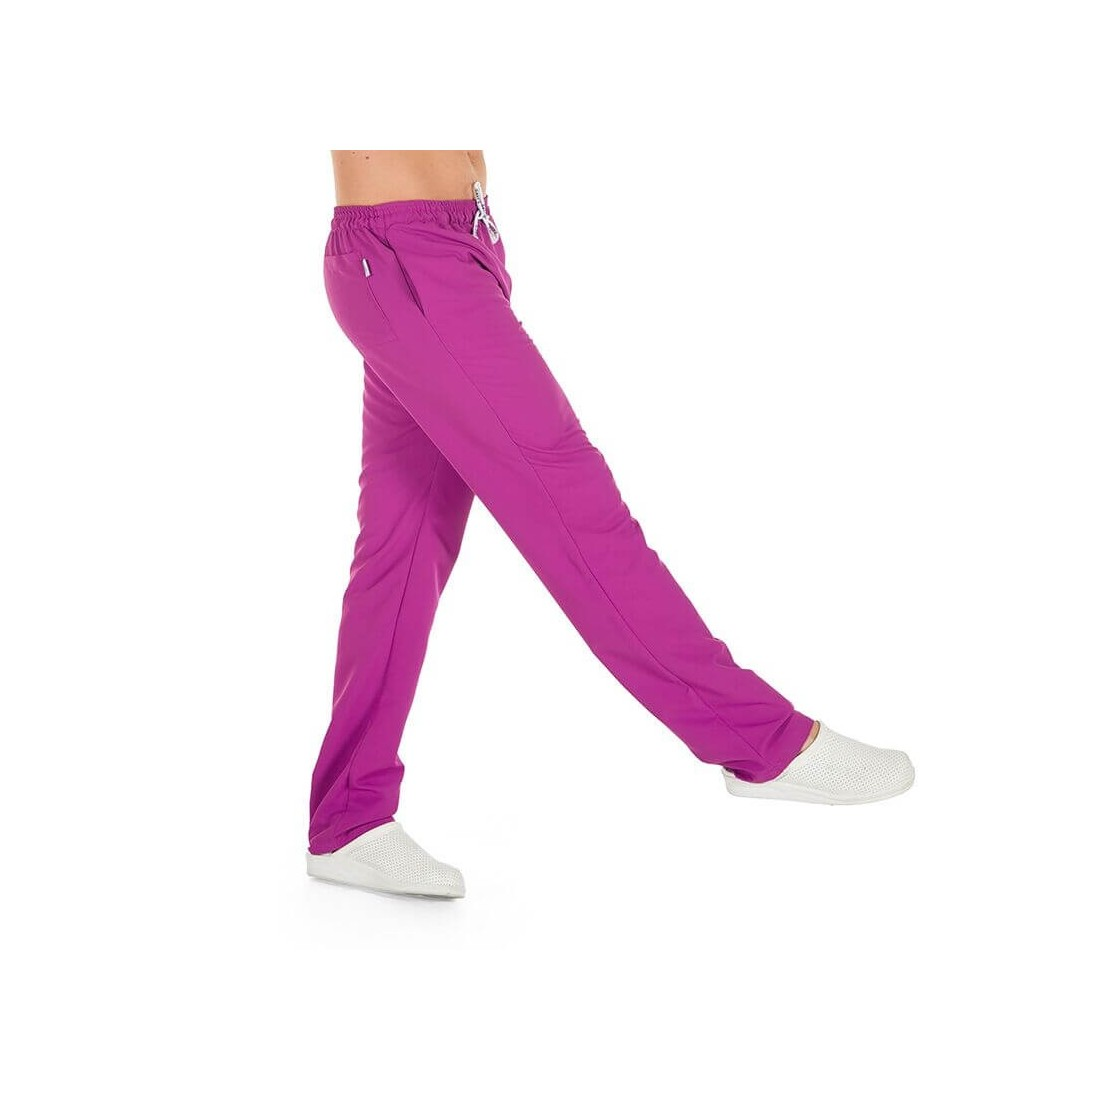 Pantalón de microfibra unisex